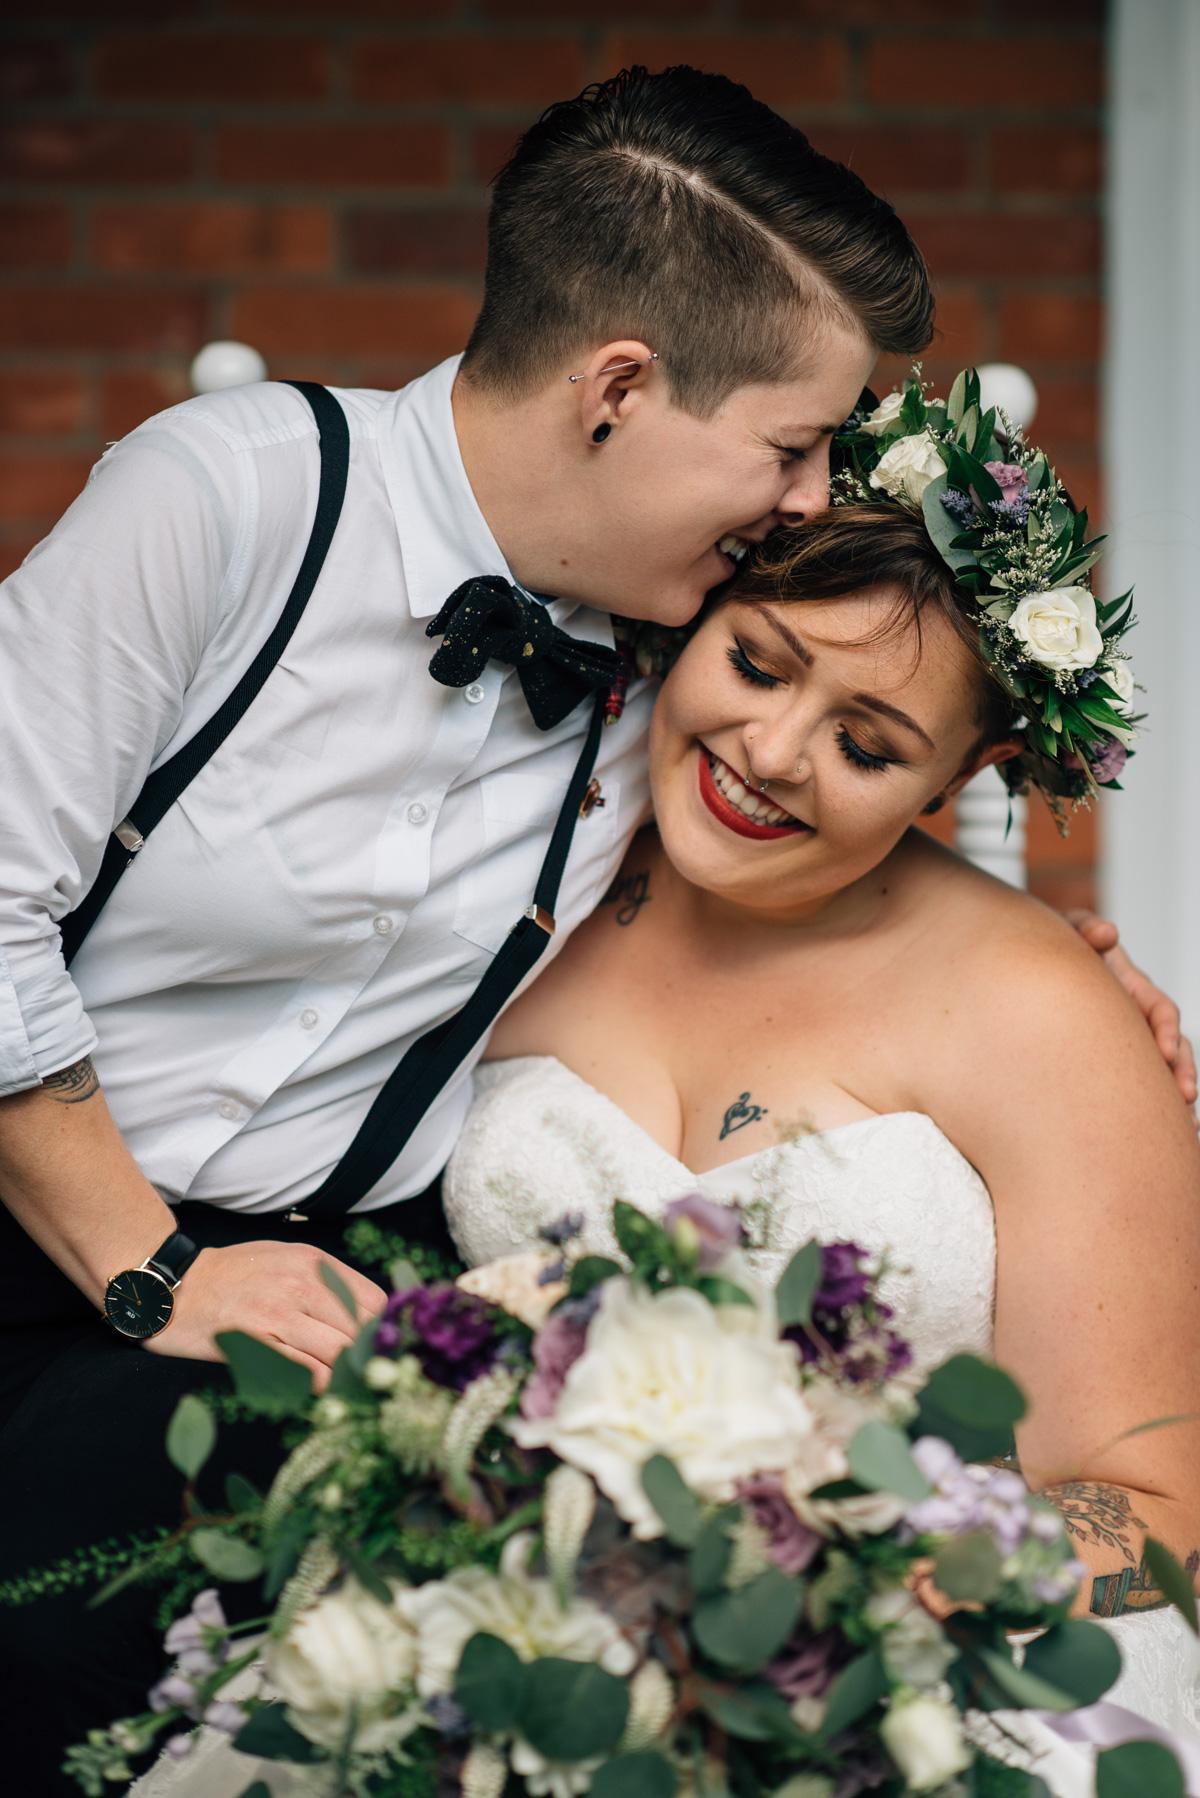 sara-wilde-photography-vineyard-bride-swish-list-beamer-falls-manor-grimsby-wedding-49.jpg